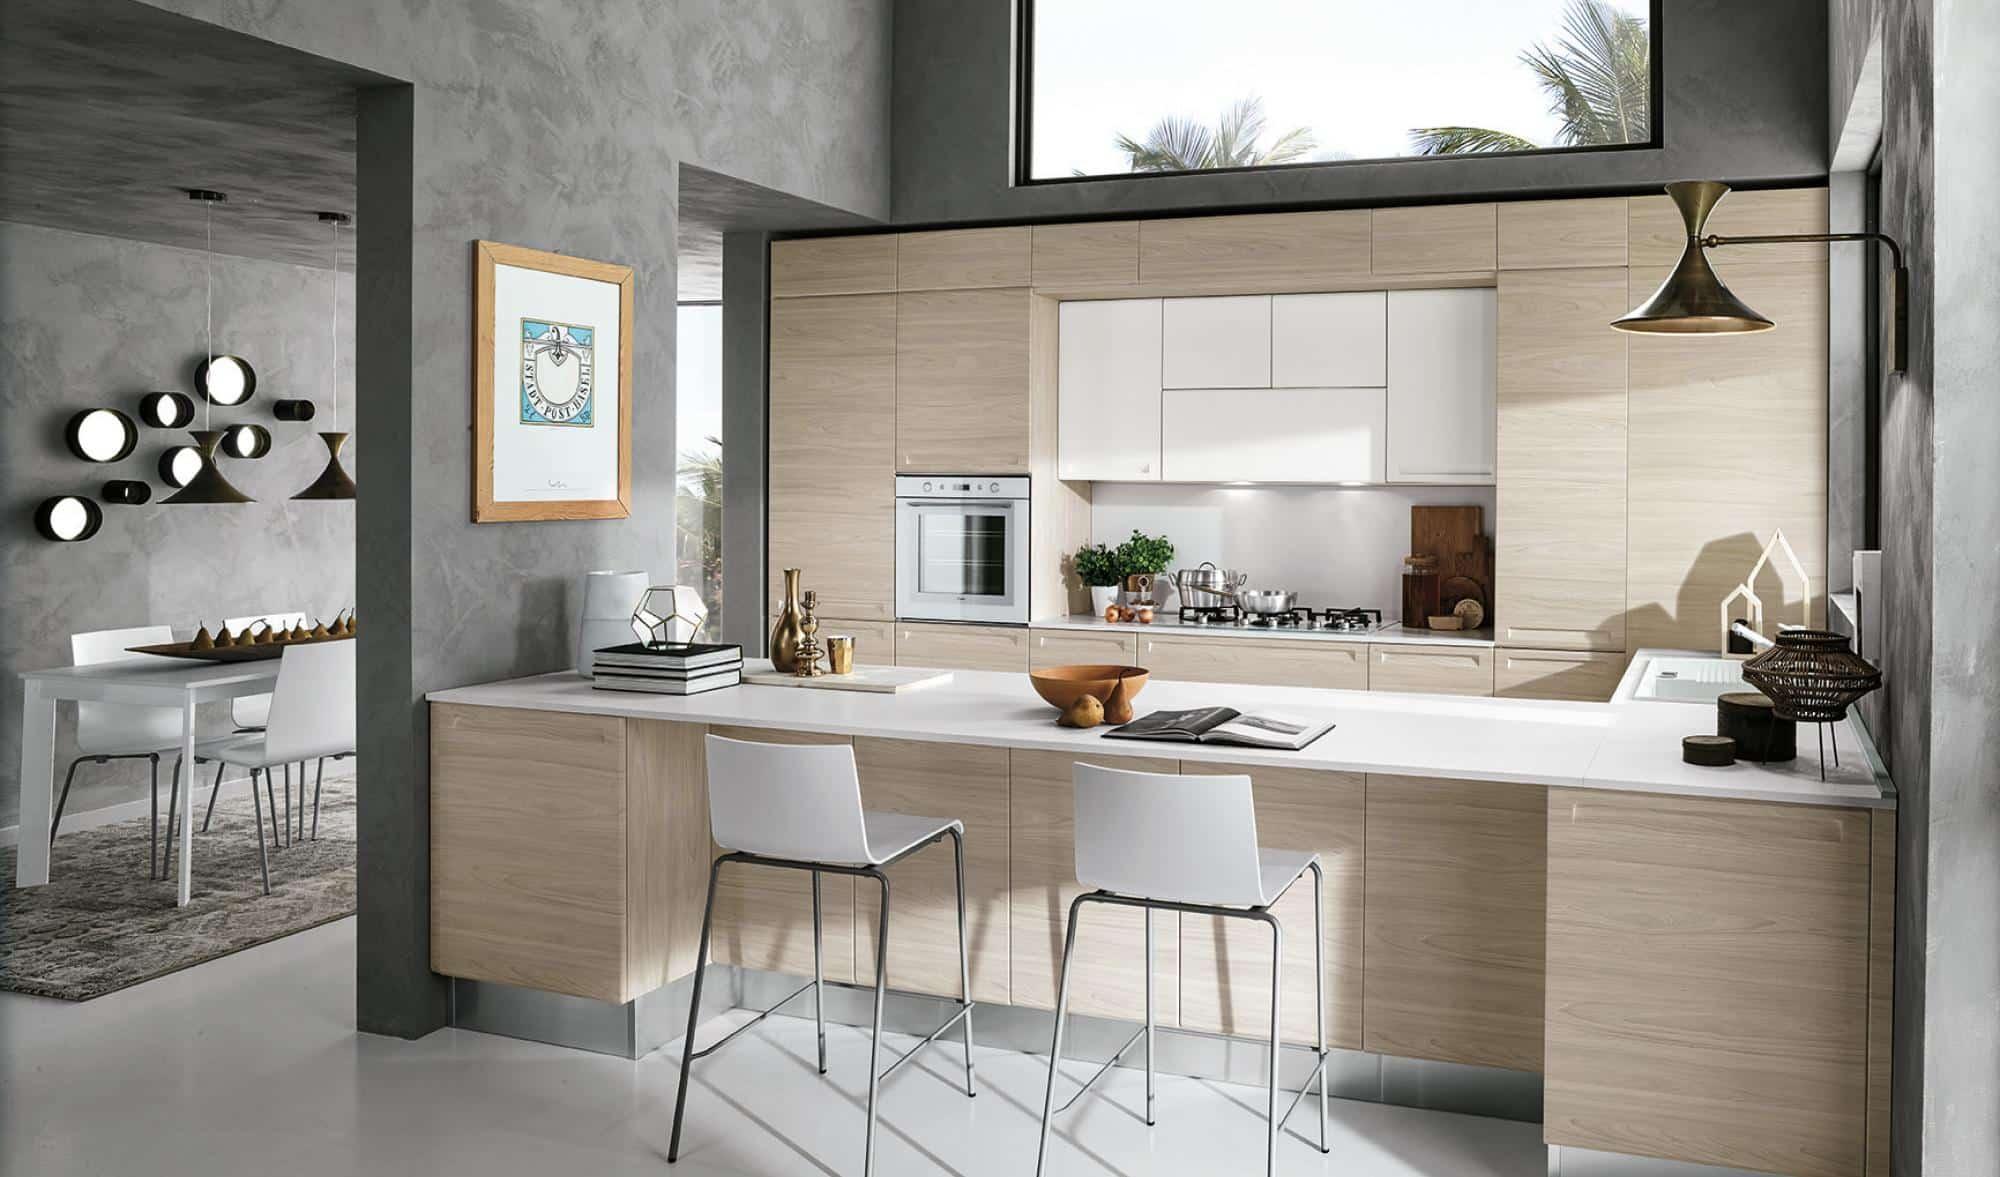 Isla κουζινα σε φυσικο χρωματισμο με λευκο πολυμερικο με ενσωματωμενη λαβη και ρετρο υφος